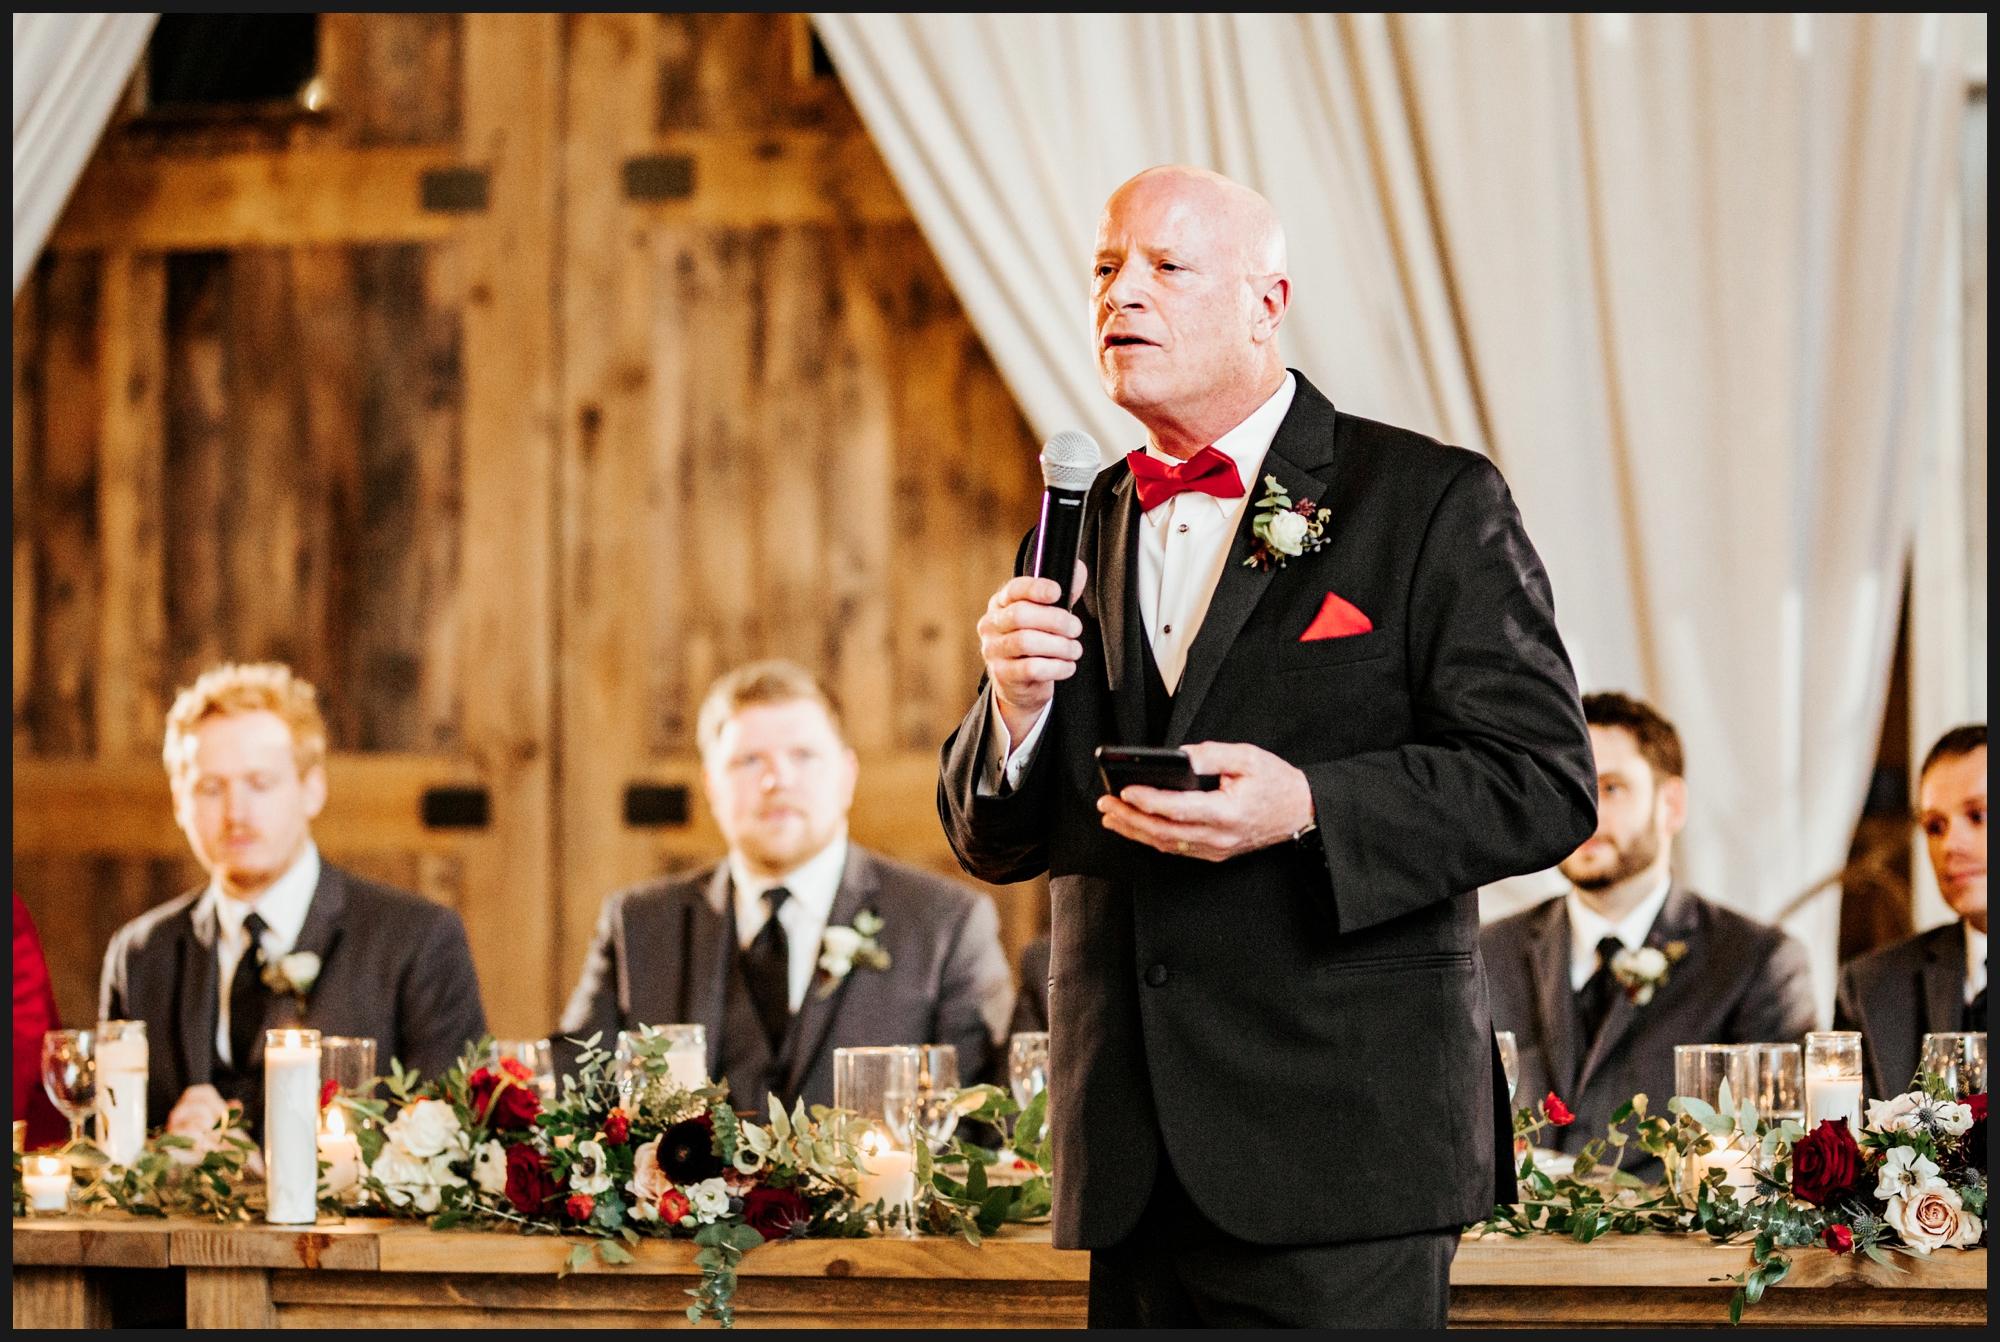 Orlando-Wedding-Photographer-destination-wedding-photographer-florida-wedding-photographer-hawaii-wedding-photographer_0539.jpg